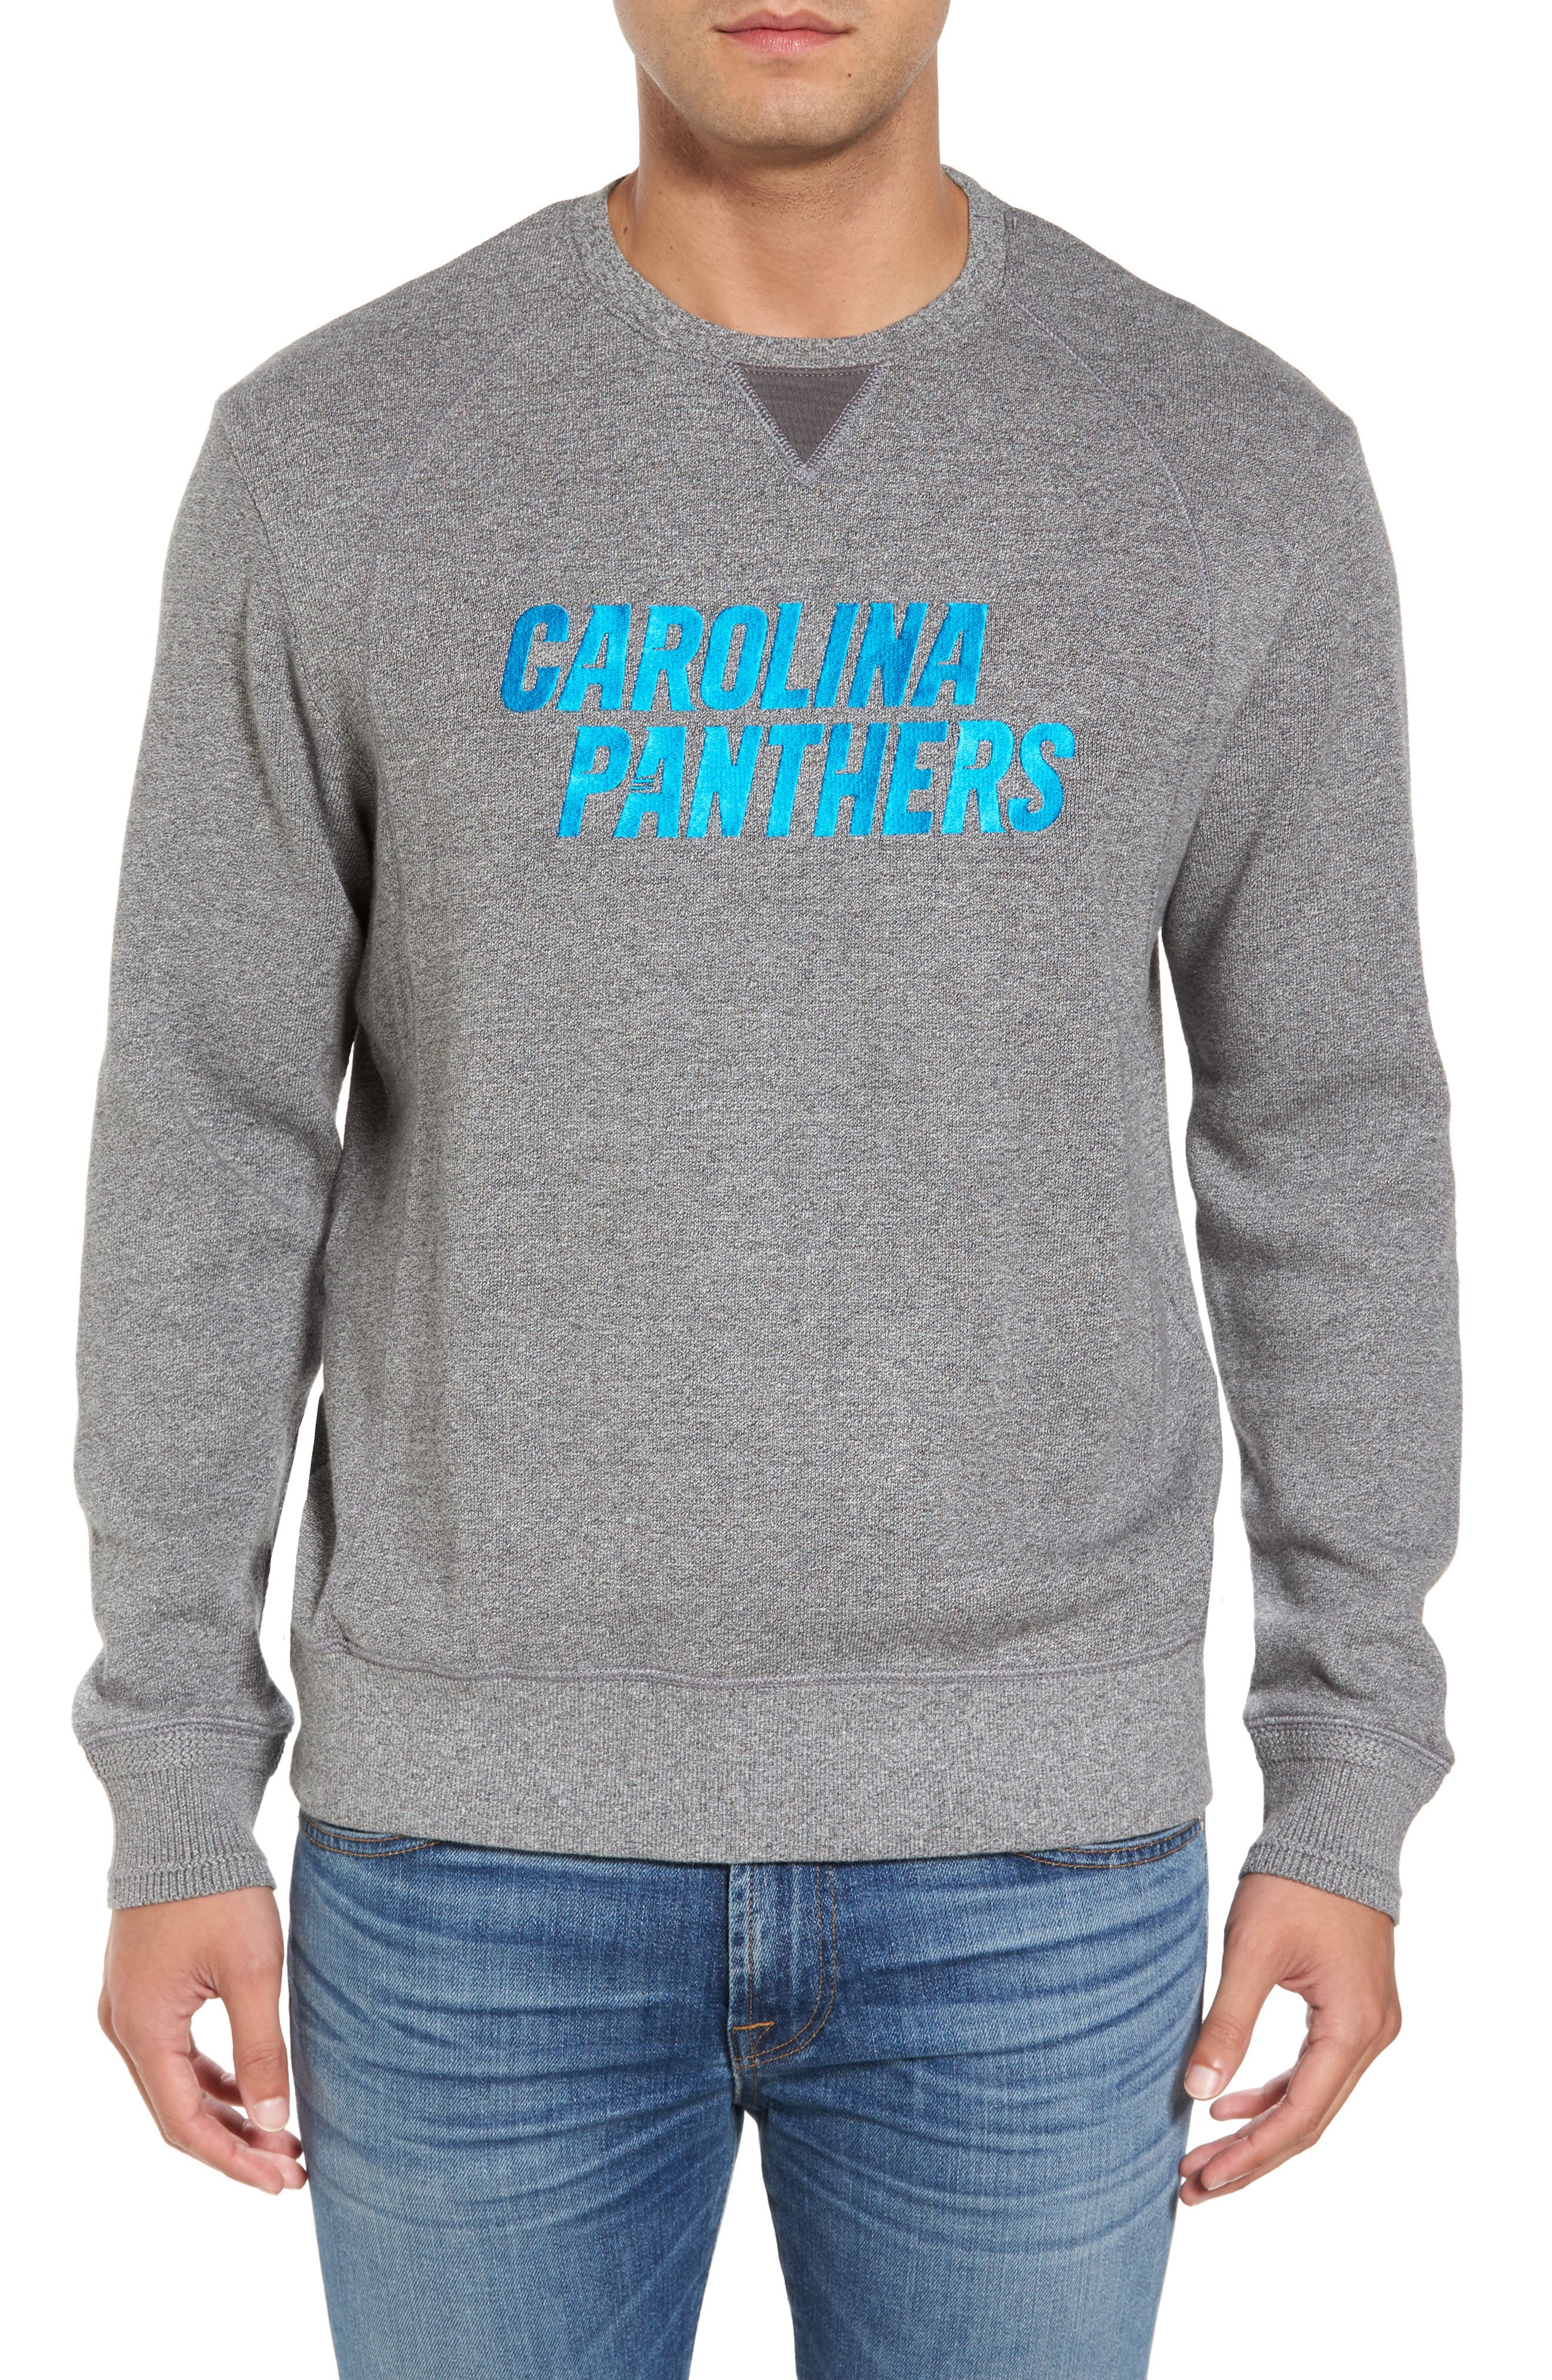 NFL Stitch of Liberty Embroidered Crewneck Sweatshirt,                             Main thumbnail 21, color,